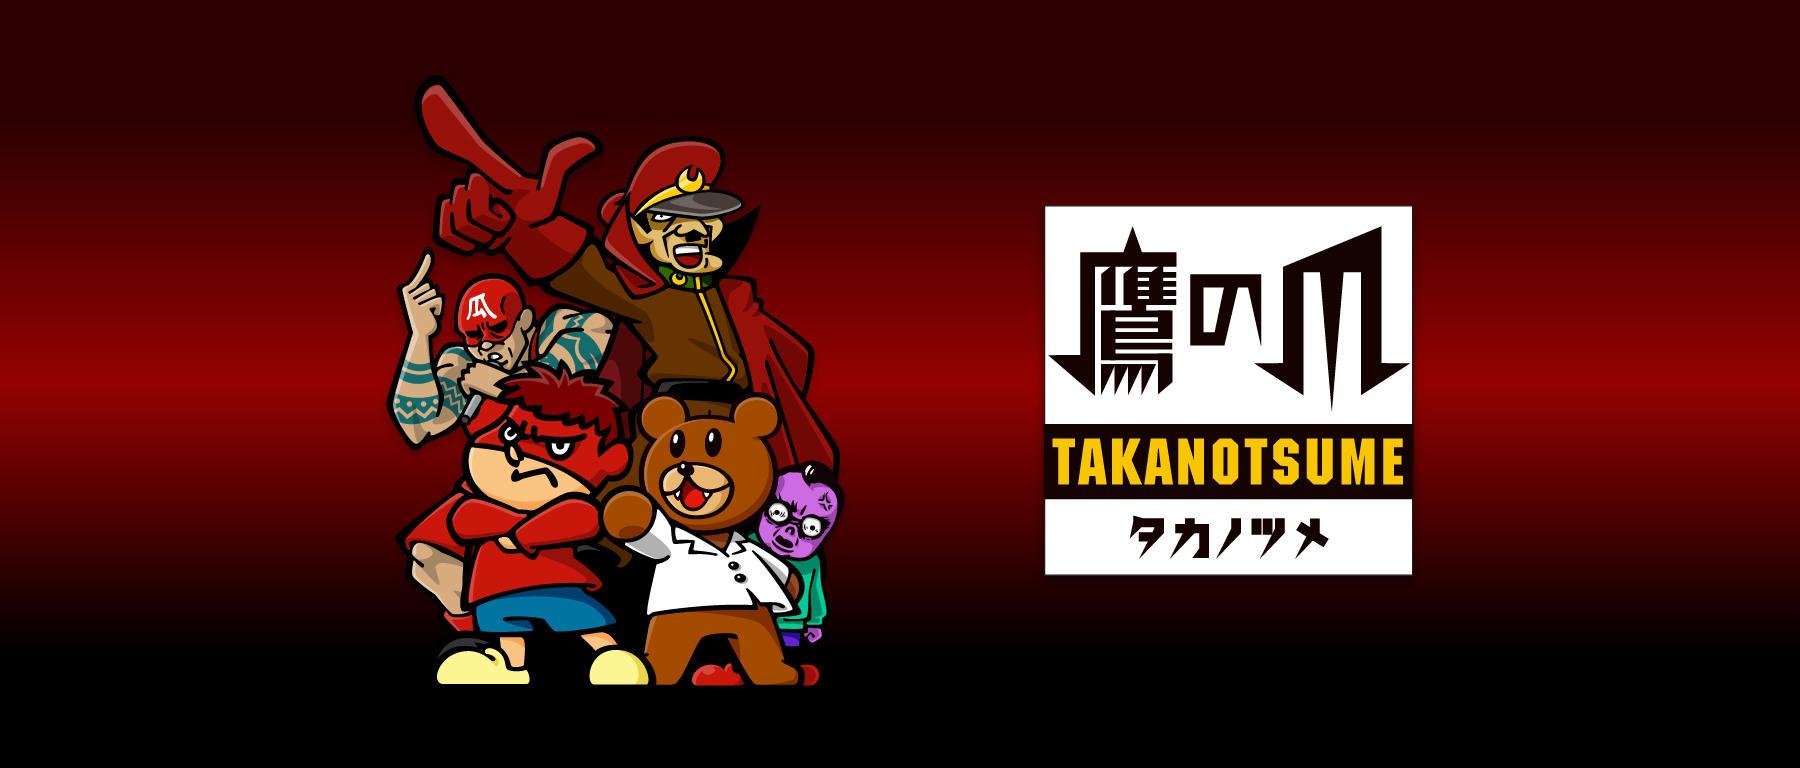 https://www.dle.jp/jp/service/assets_c/2020/09/pc_service_MV_takanotsume-thumb-1800x768-3578.jpg